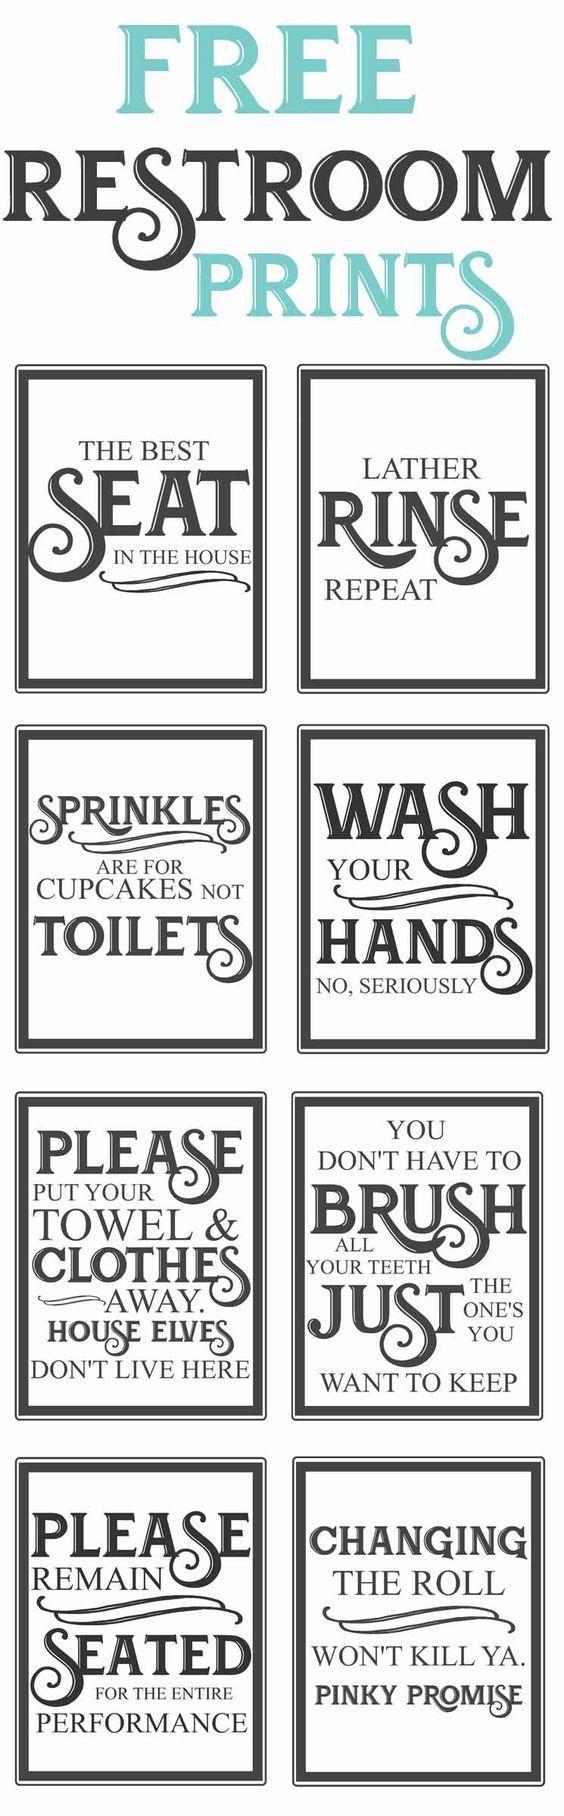 Free Vintage Bathroom Printables | Favorite Diy And Best Crafts - Free Printable Flush The Toilet Signs